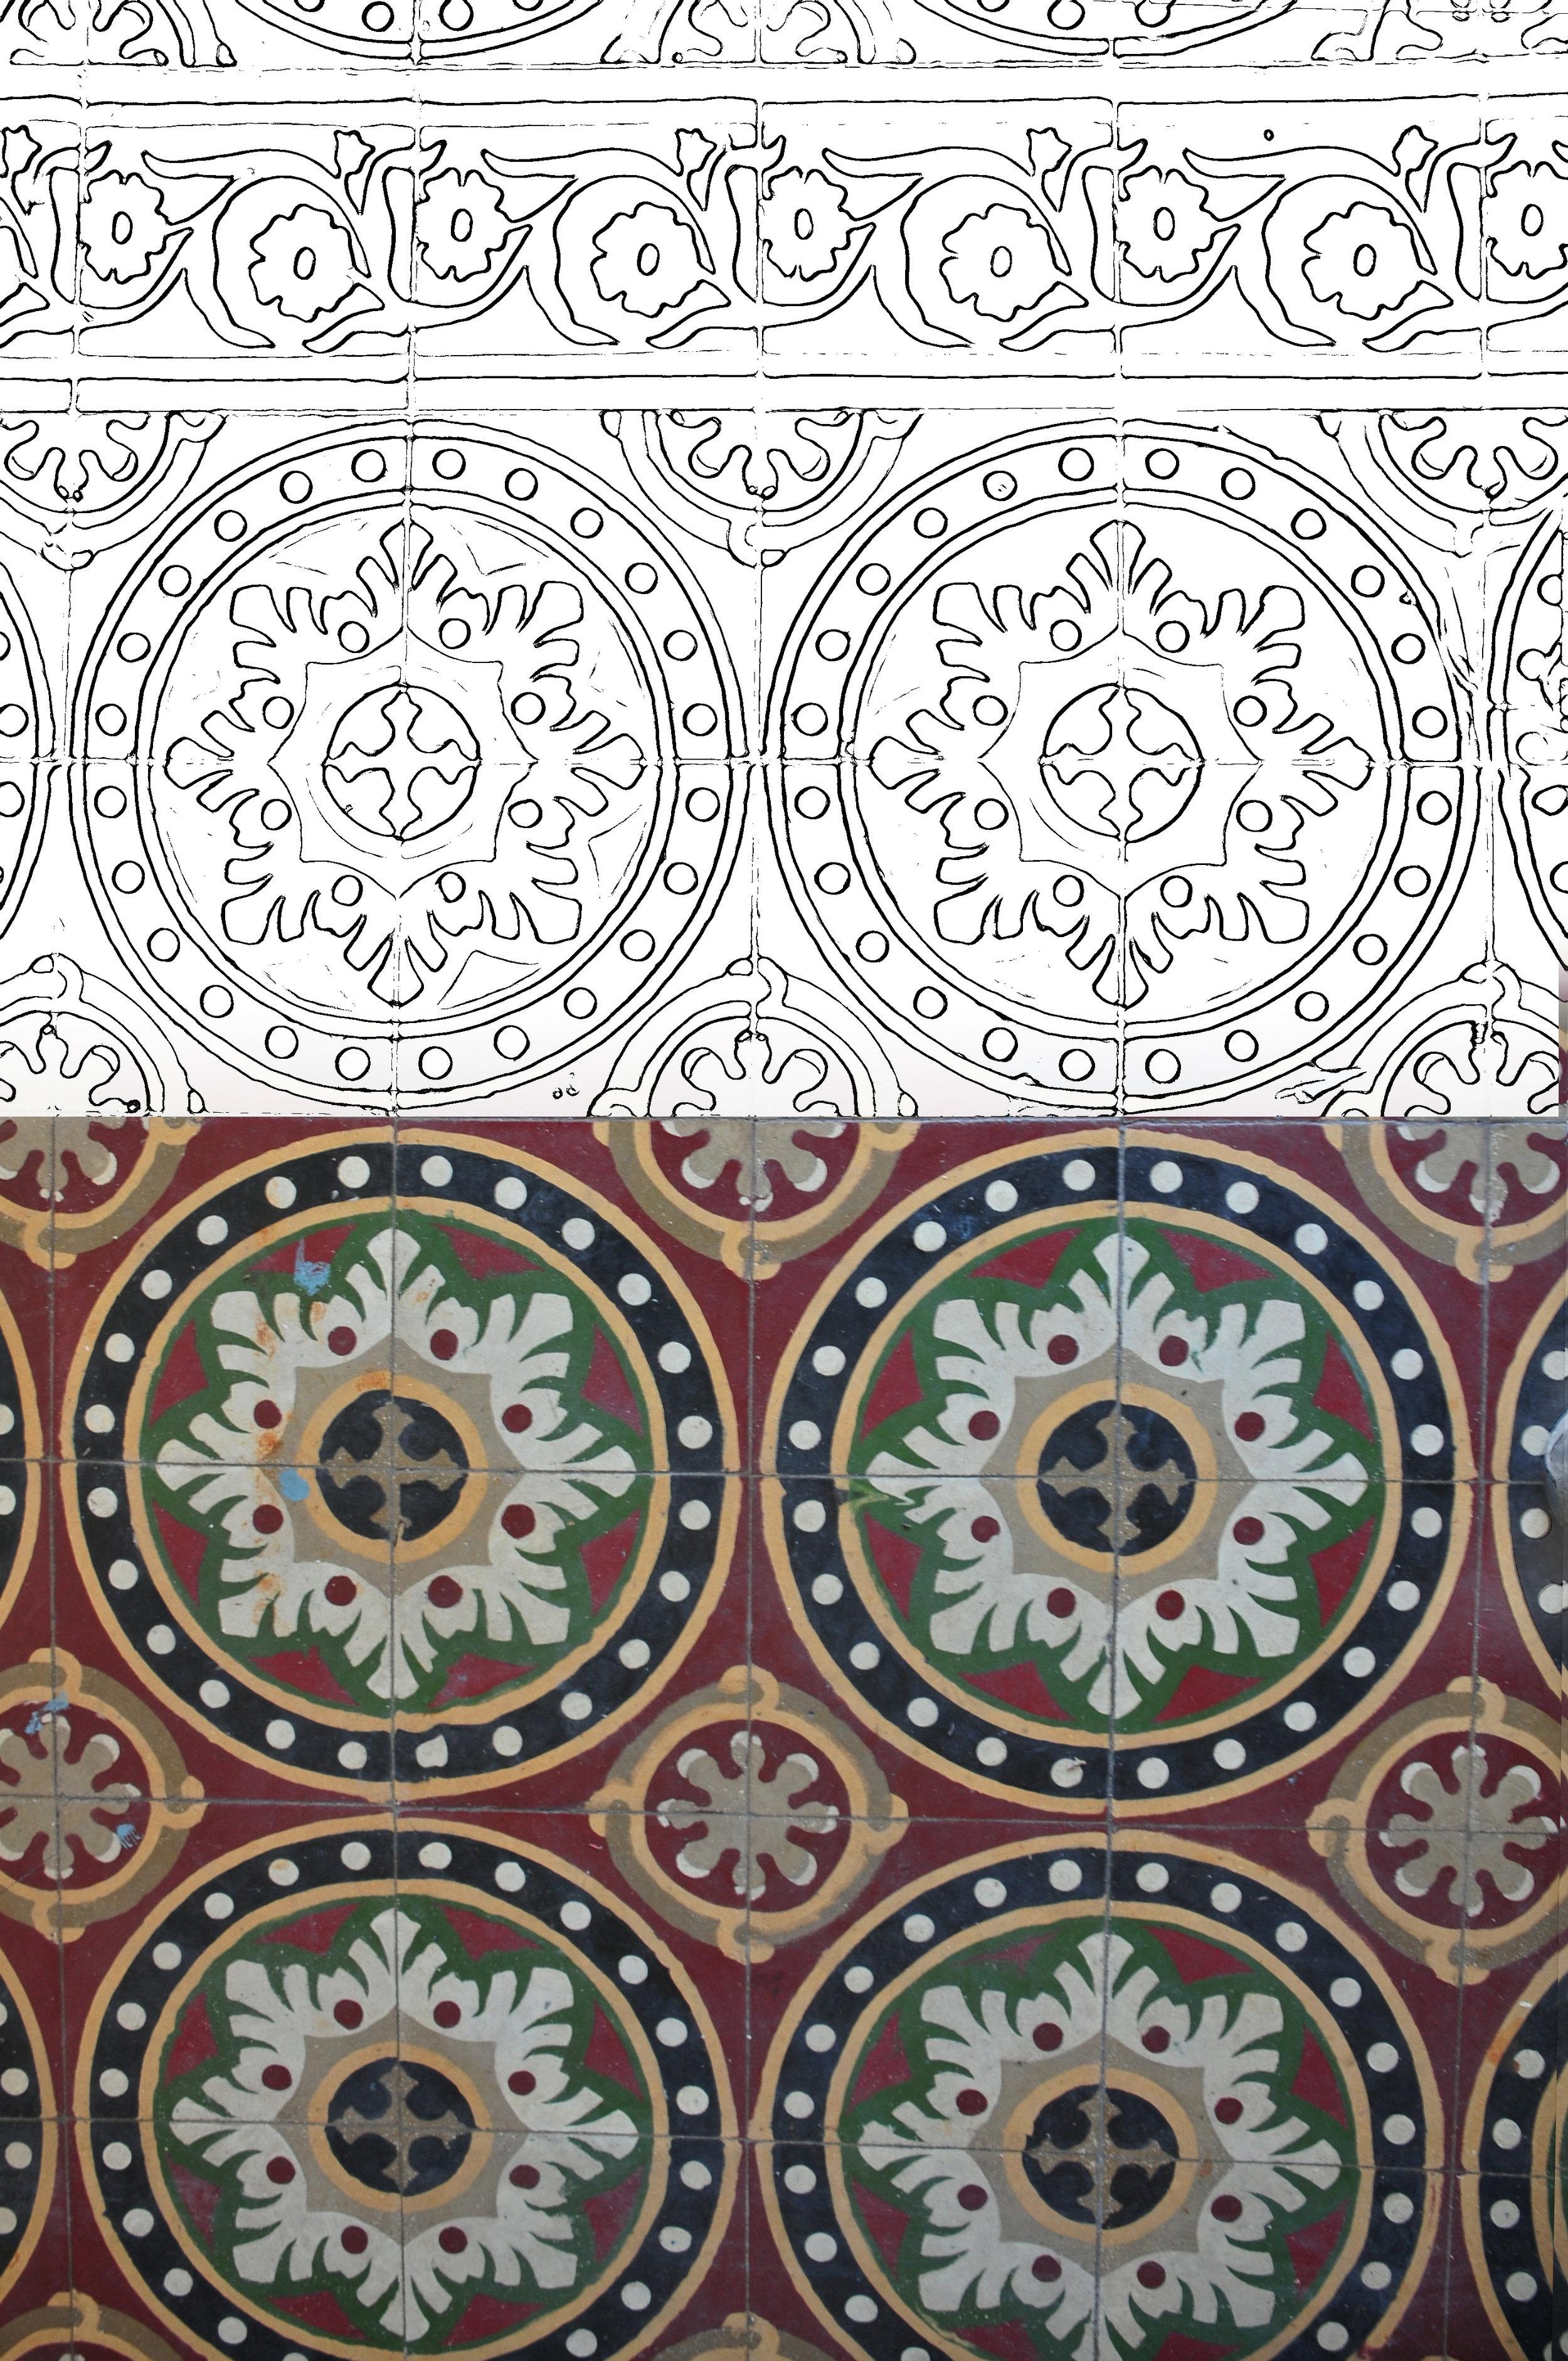 Original restored Italian tiles, 1923